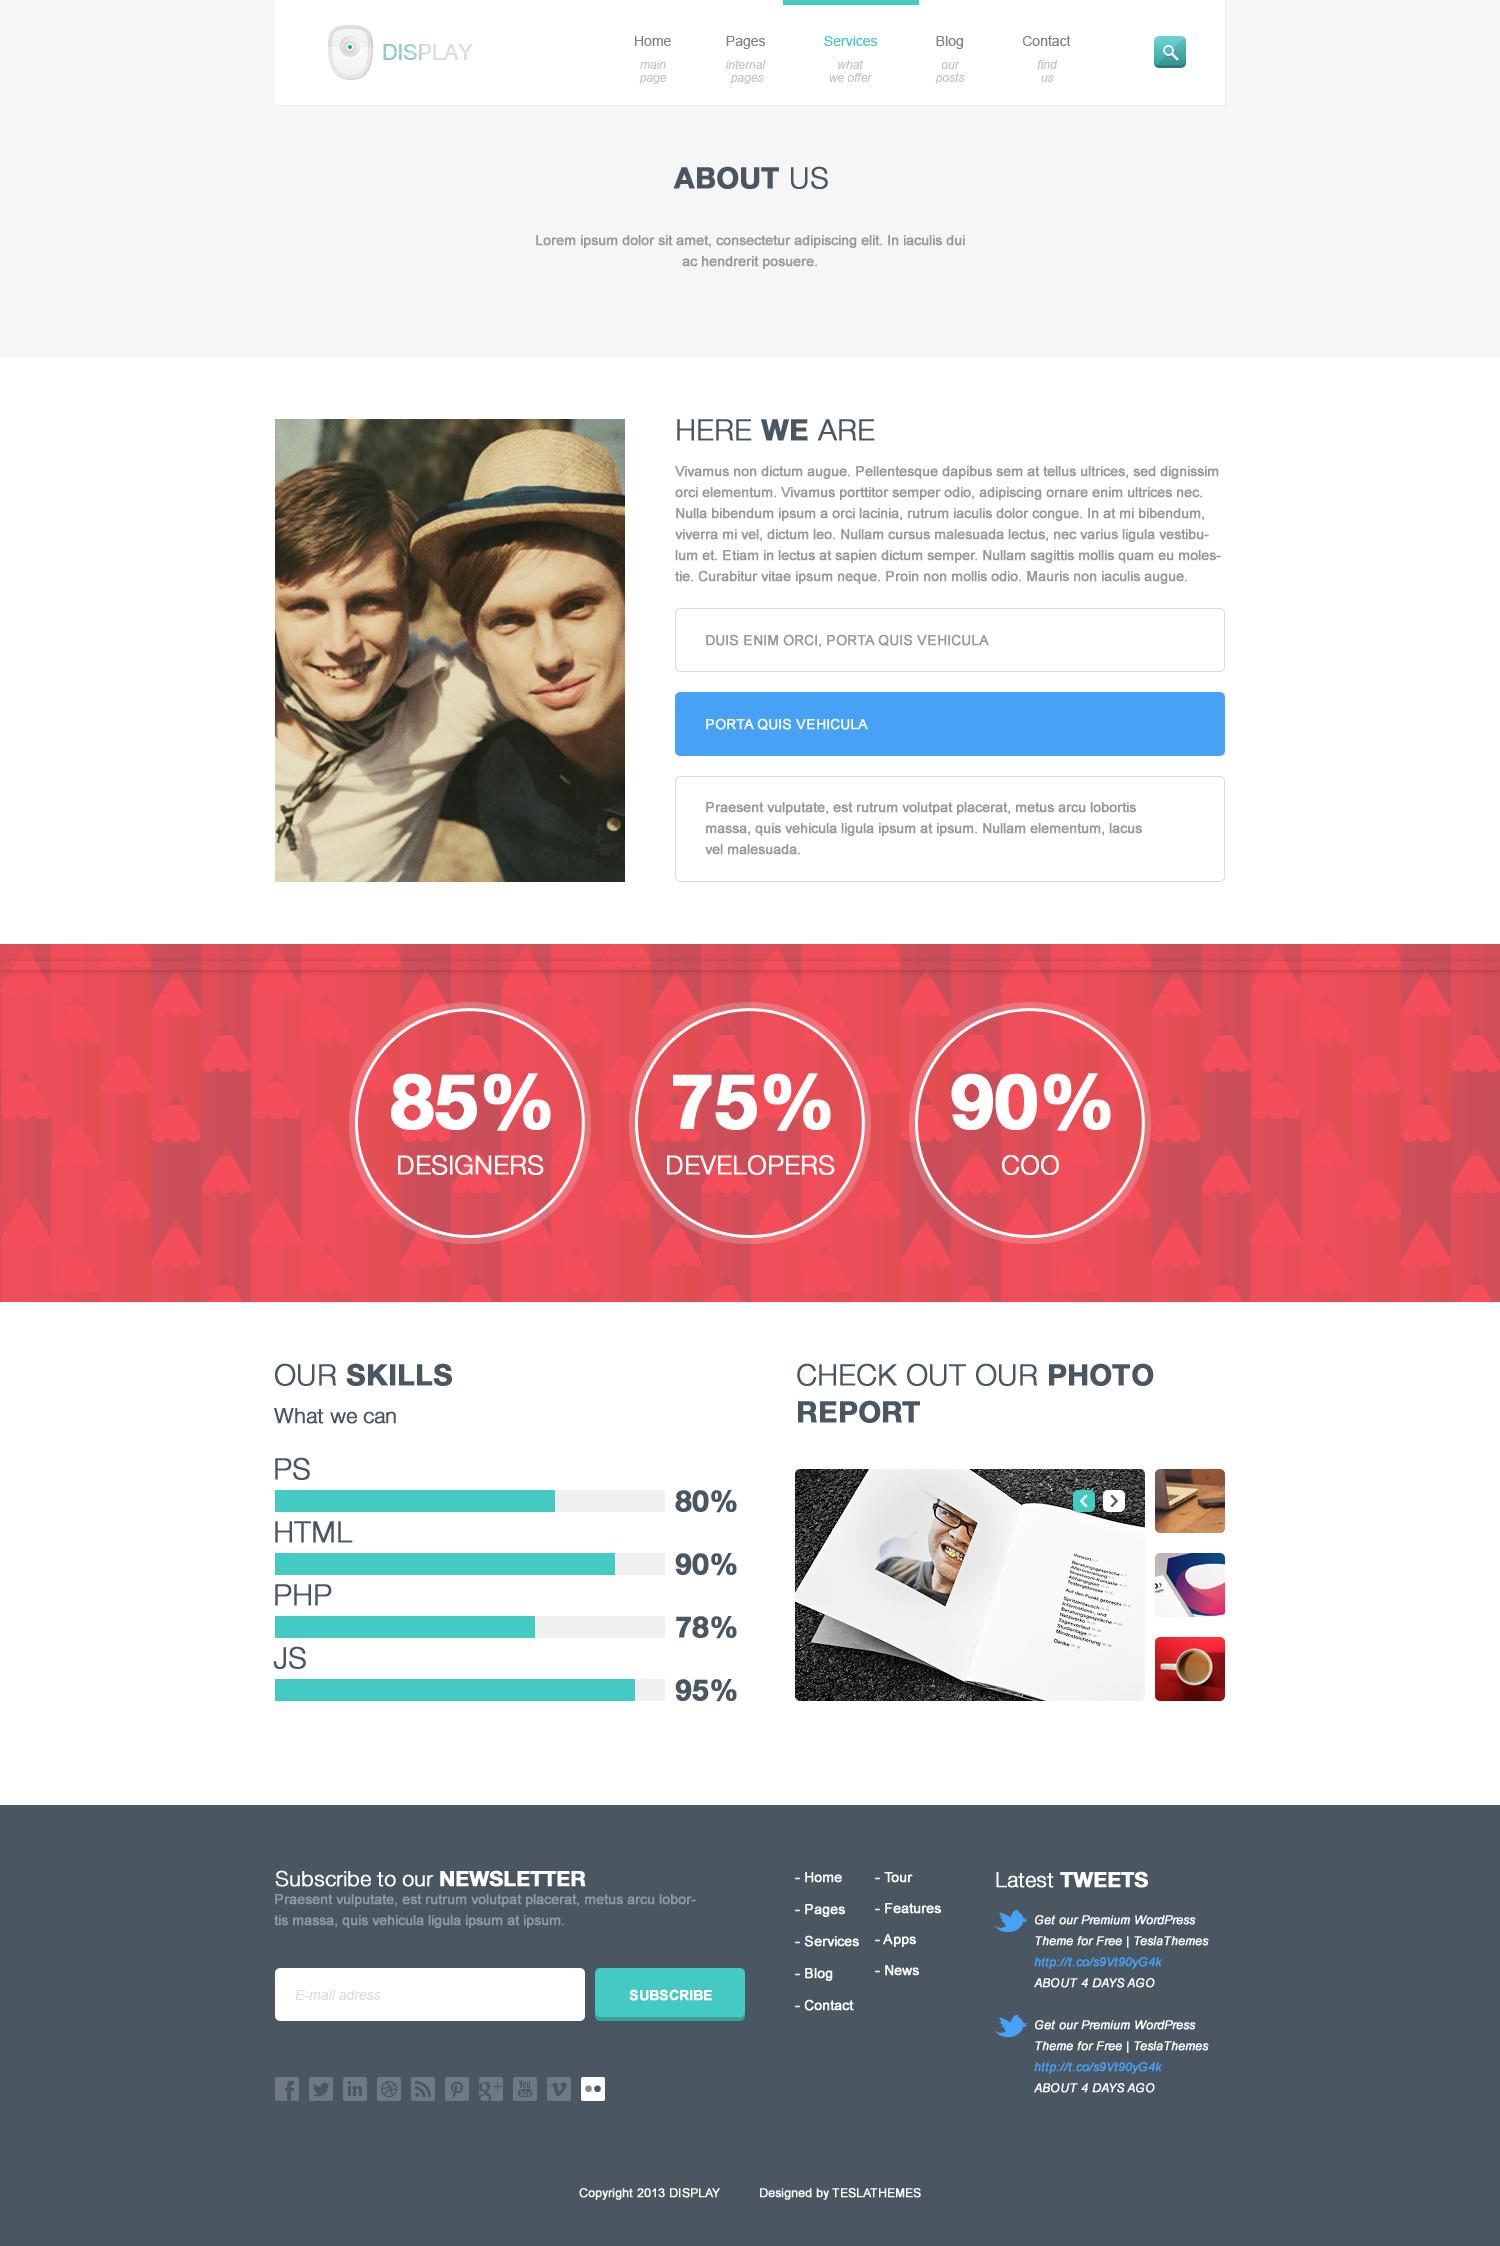 Display - Responsive WordPress Theme